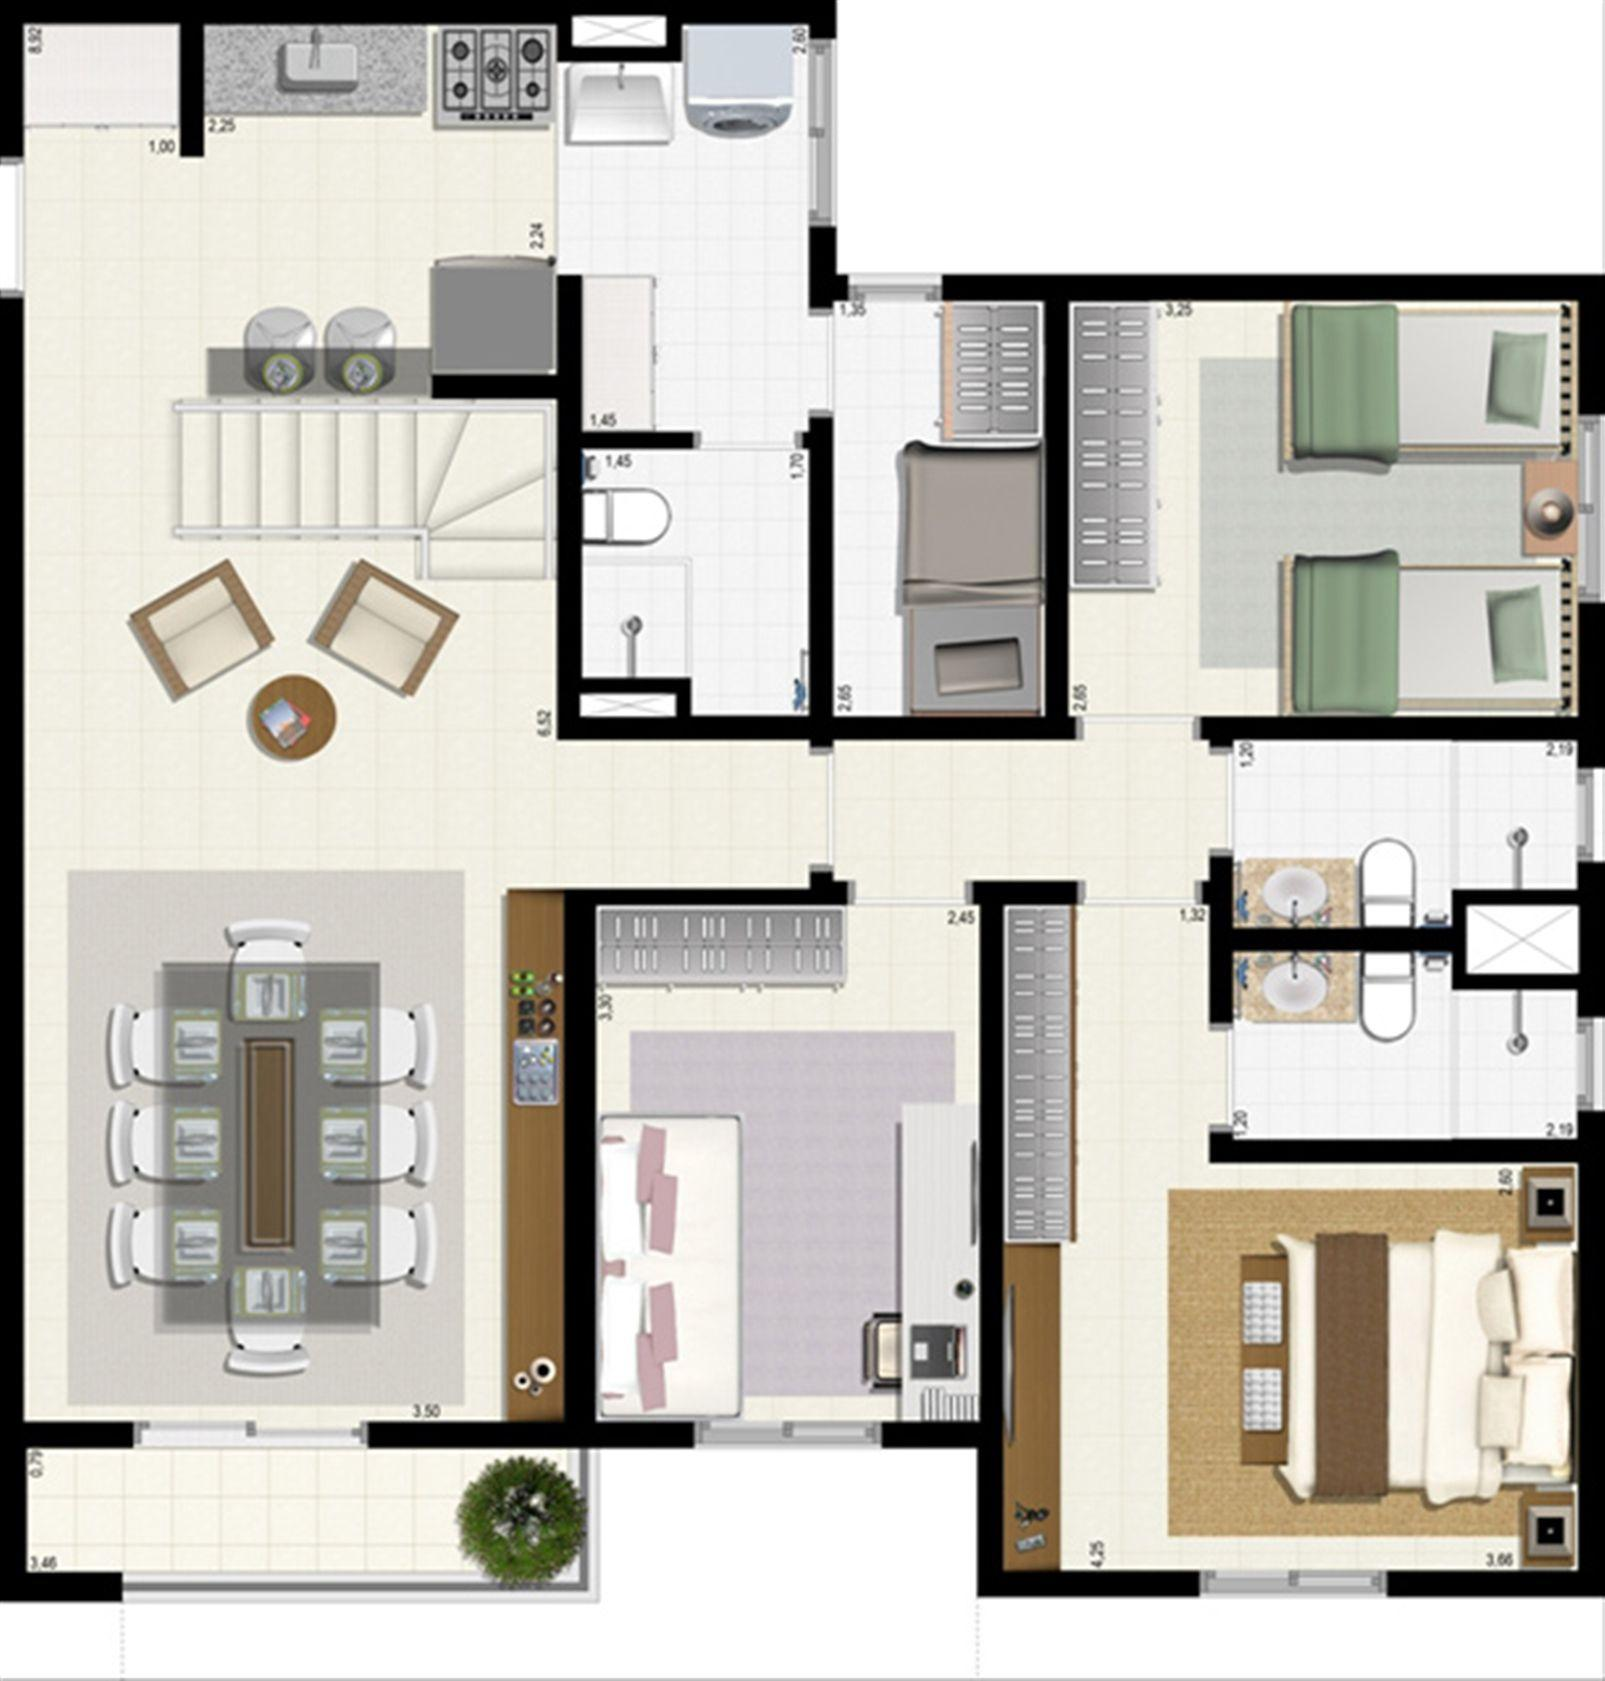 Planta duplex 153 m² - inferior | L´Acqua Condominium Club – Apartamentoem  Neópolis - Natal - Rio Grande do Norte